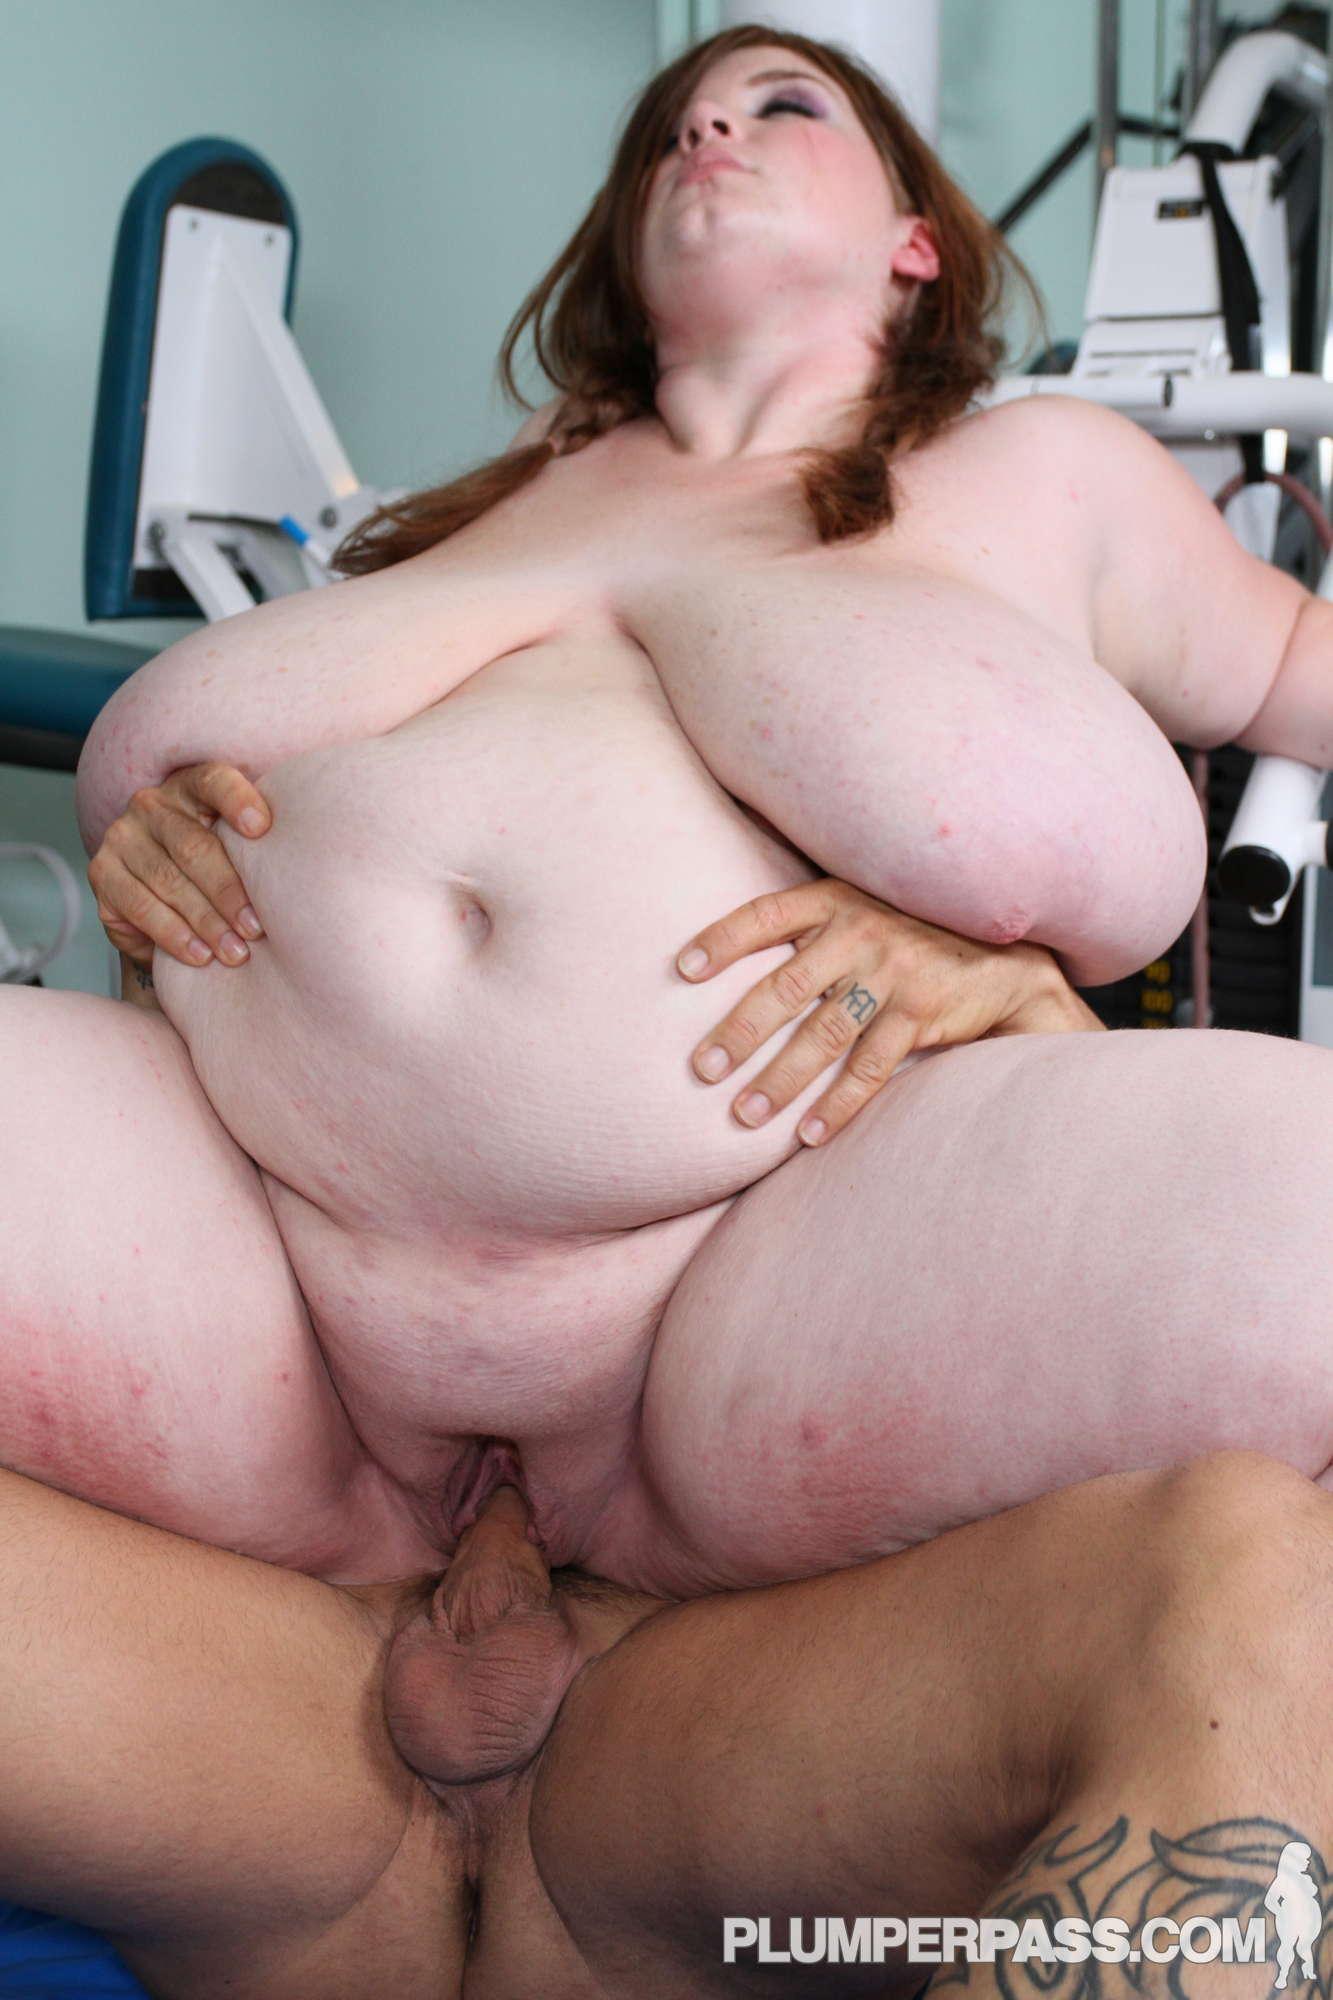 Tiny tit nude girls